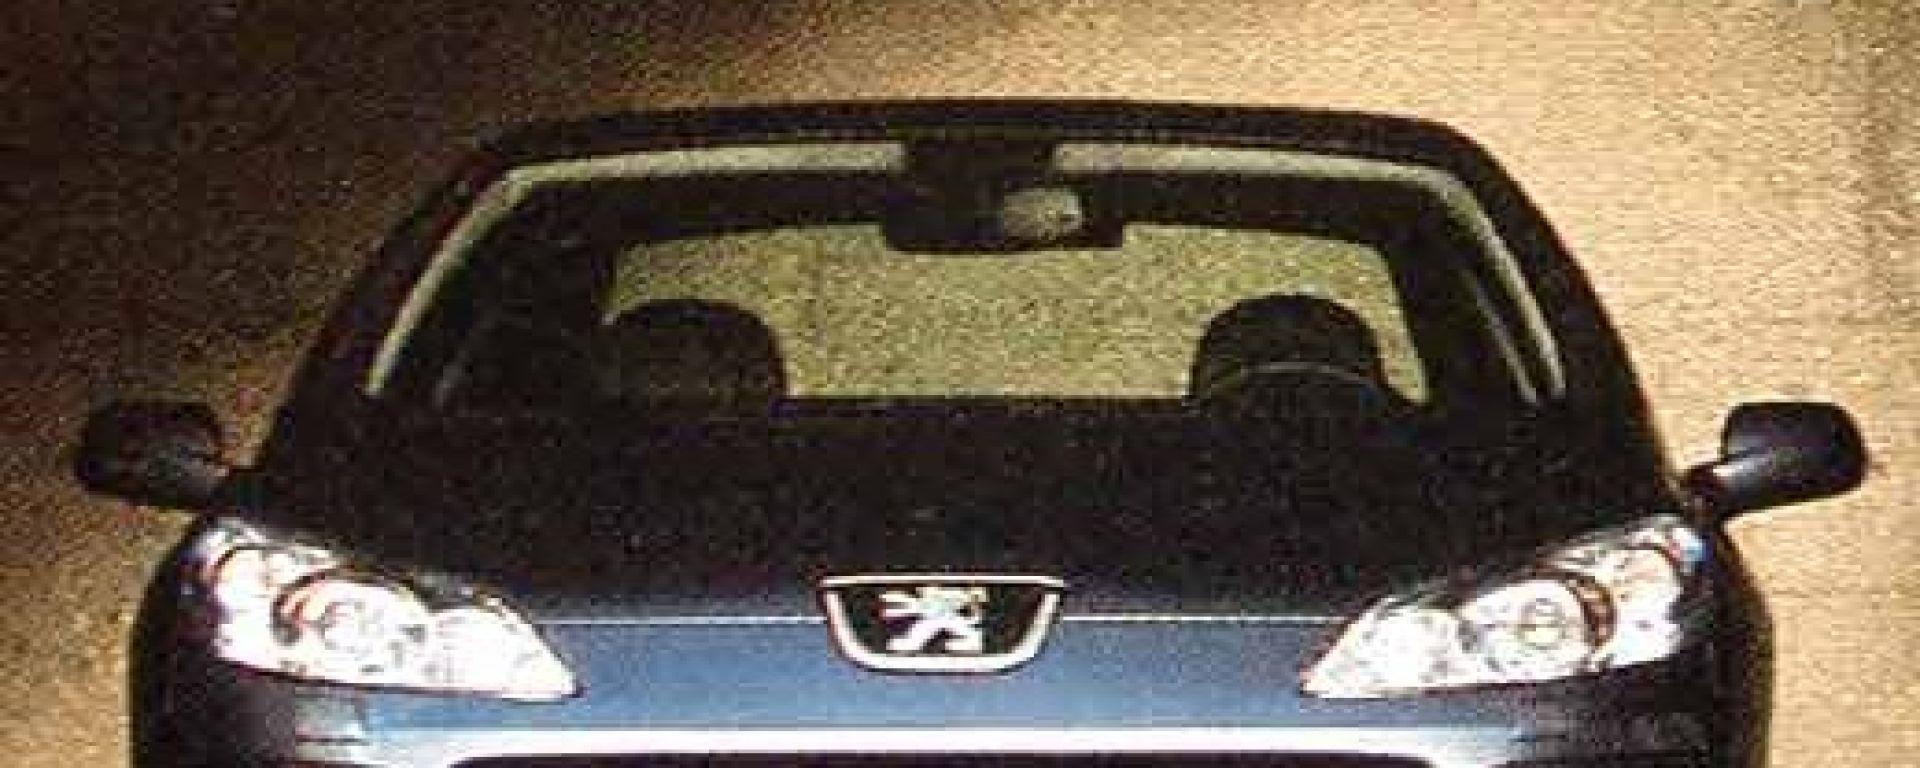 Peugeot 407: le prime immagini